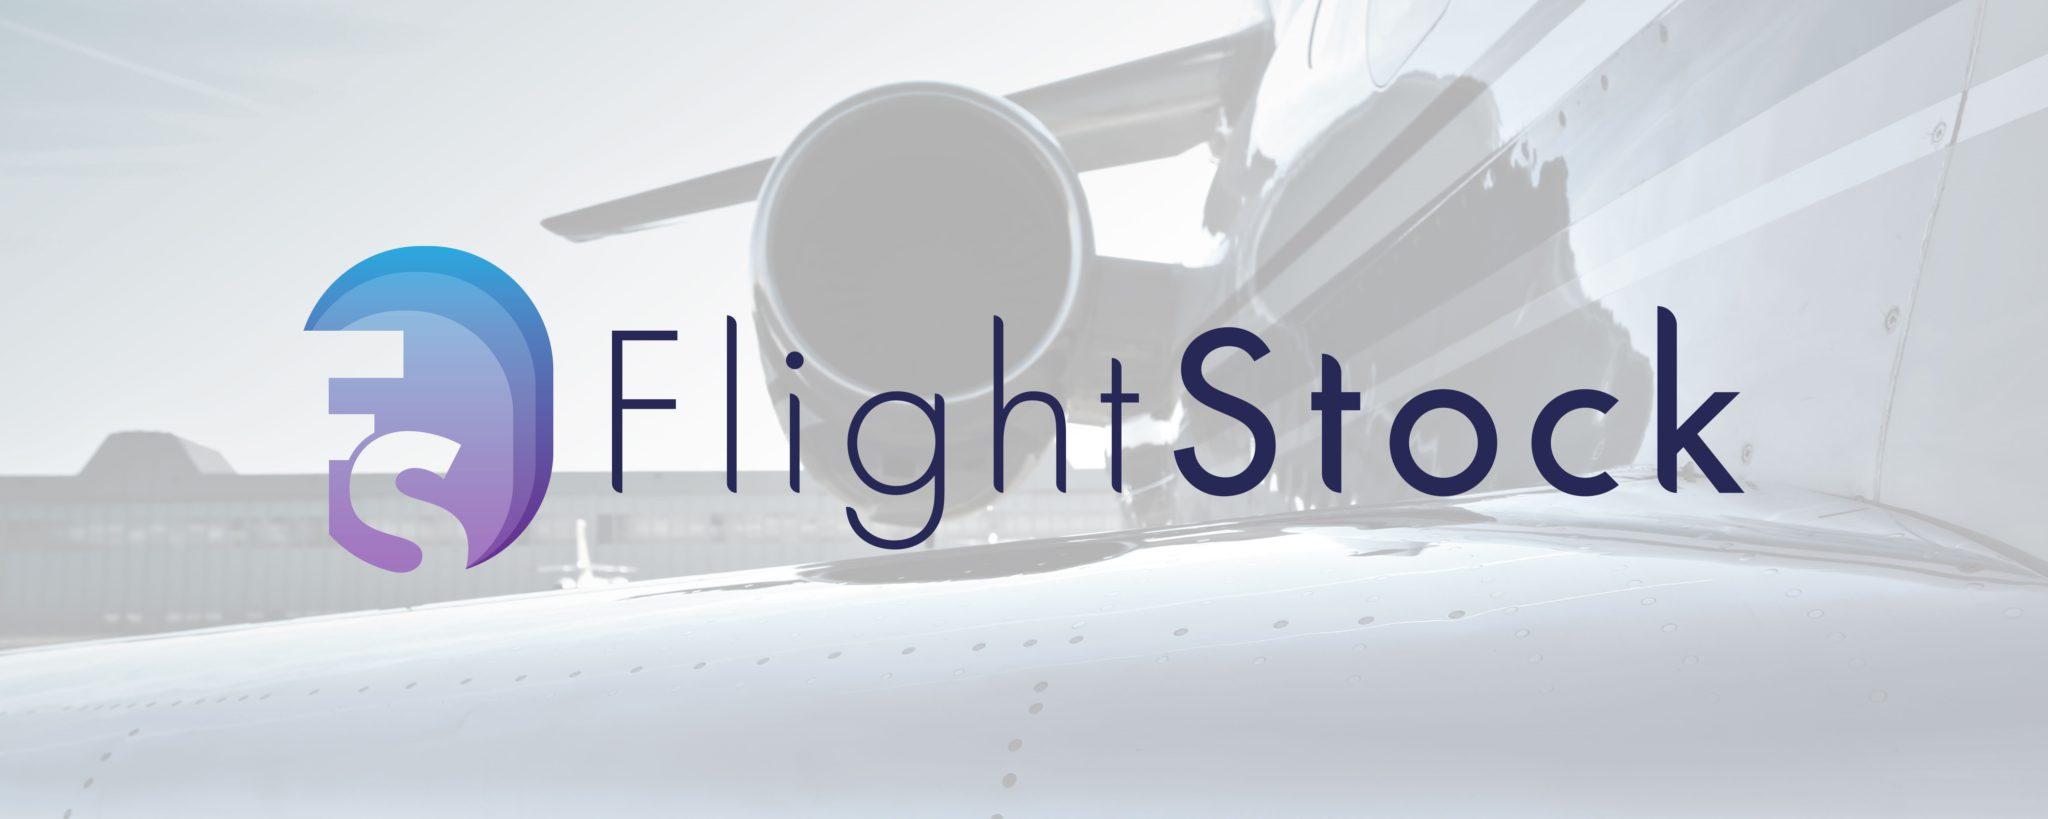 FlightStock Launched